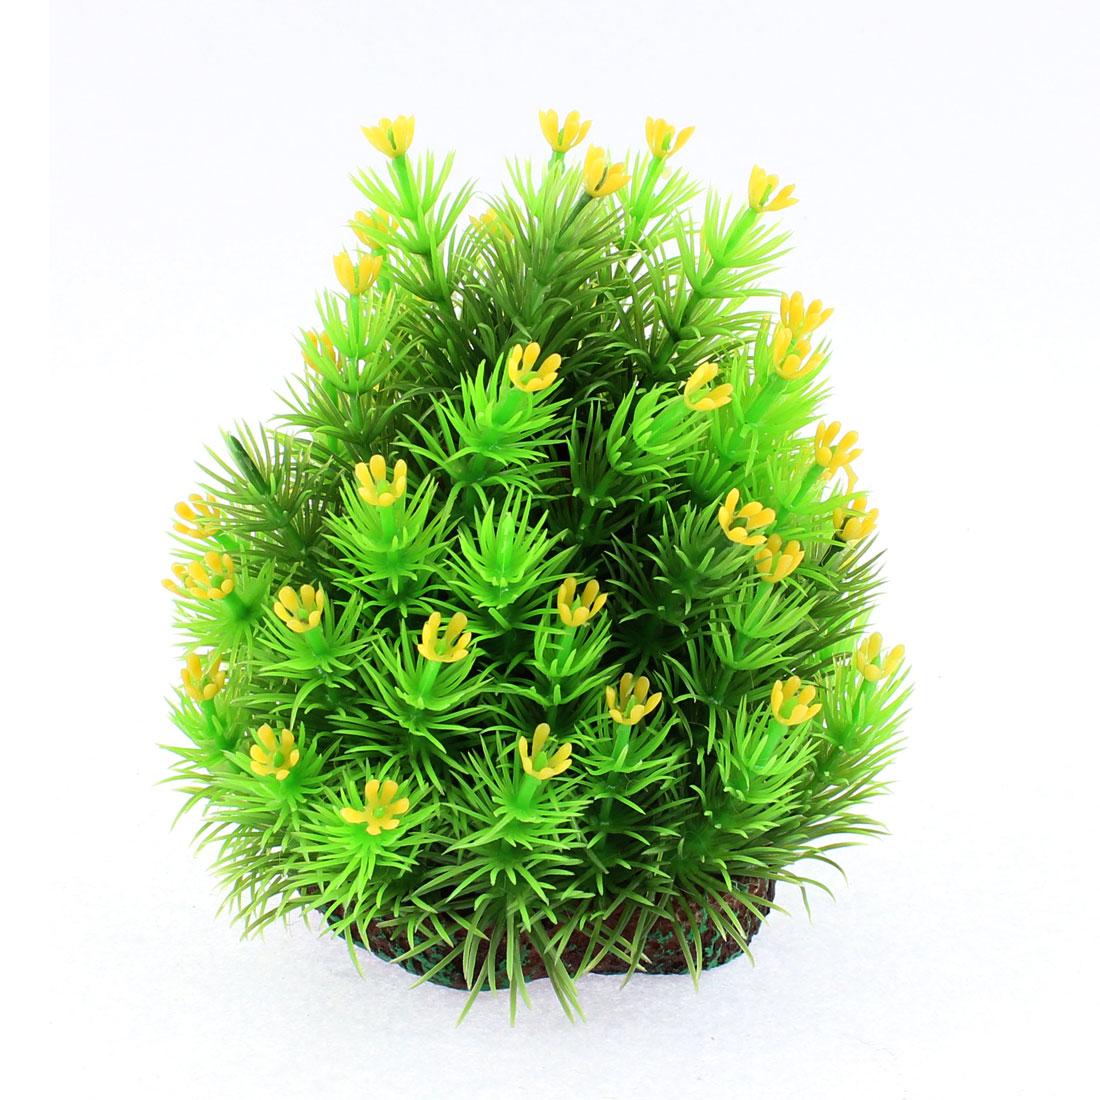 Aquarium Fishbowl Plastic Imitated Underwater Plant Grass Adornment Green Yellow